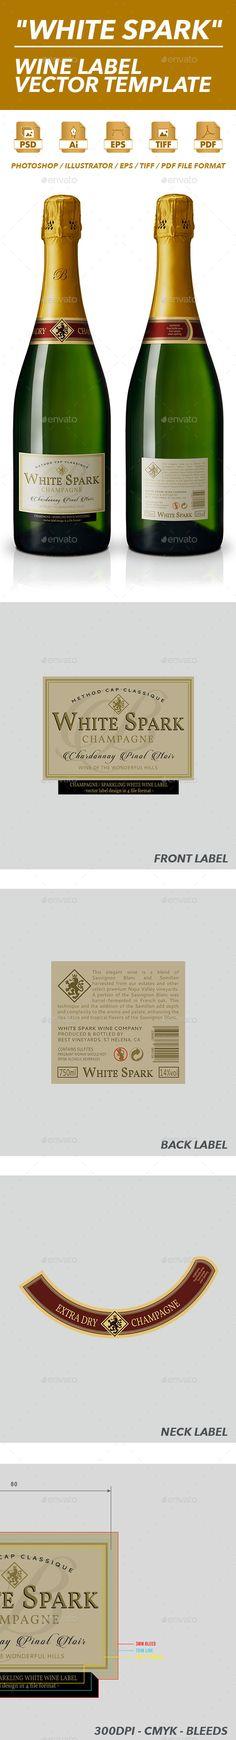 Beer Label Designs | Print templates